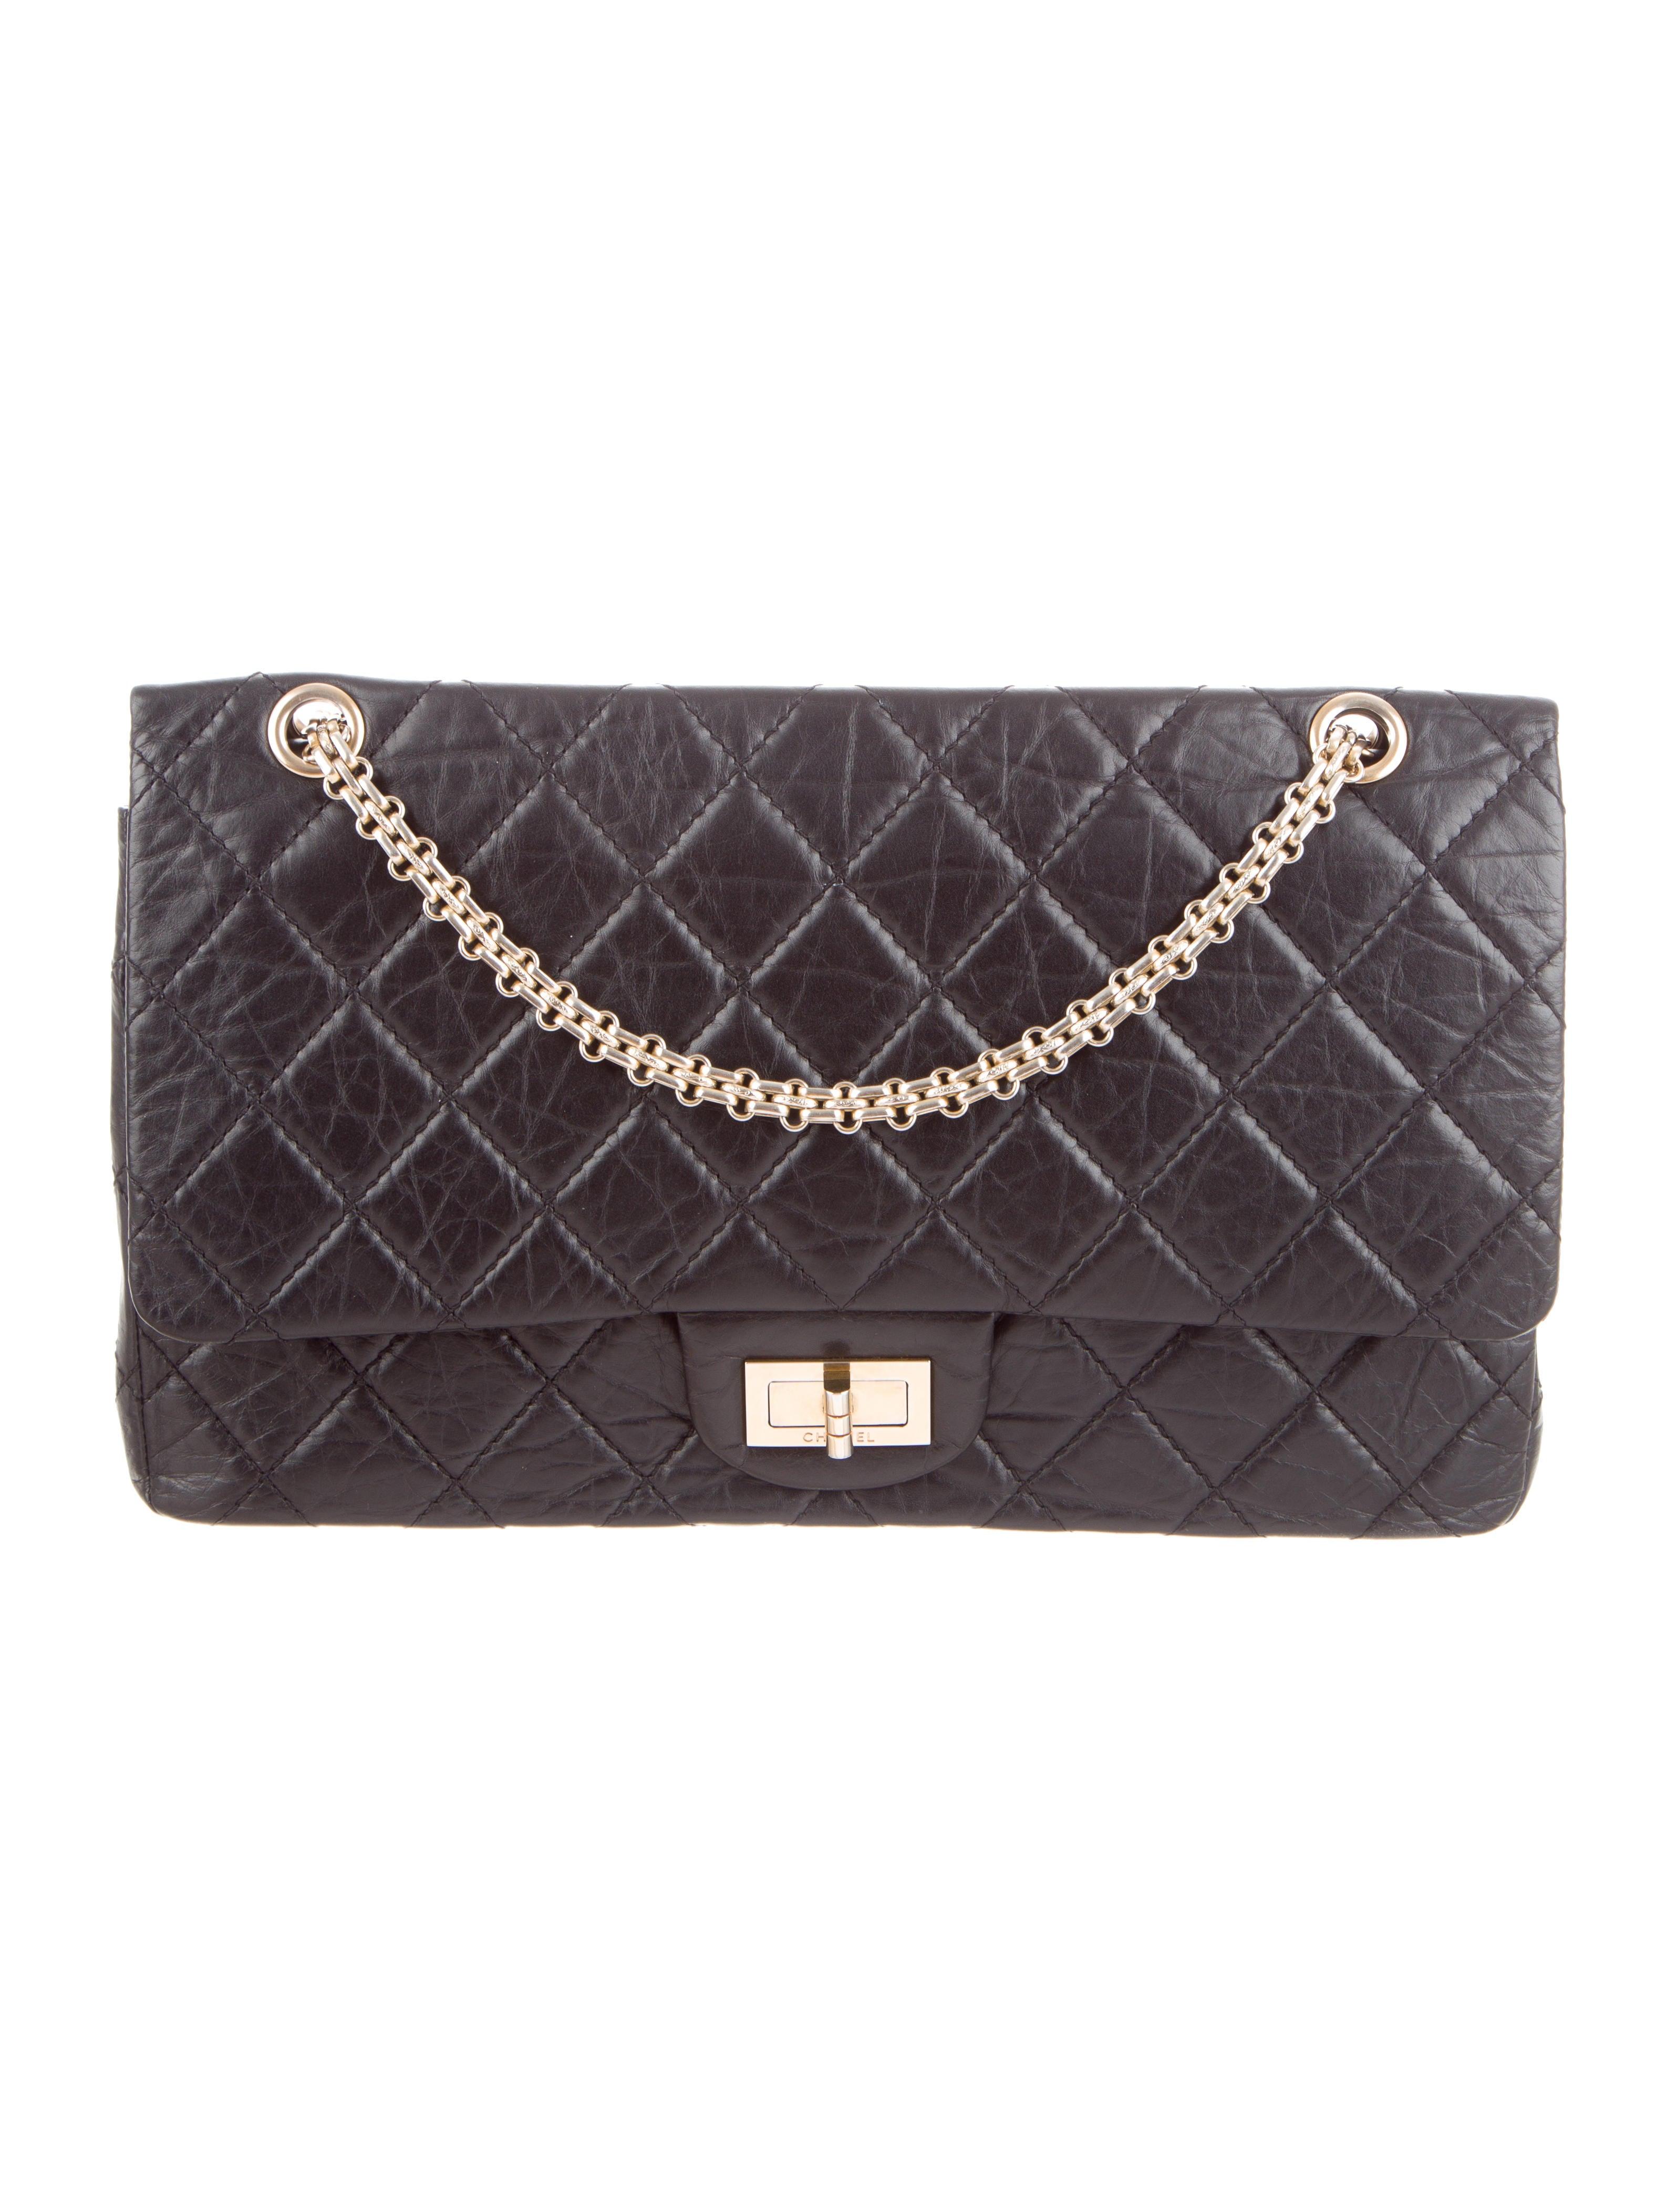 850f85ce1735 Chanel 2.55 Medium Double Flap Bag - Handbags - CHA38519   The RealReal